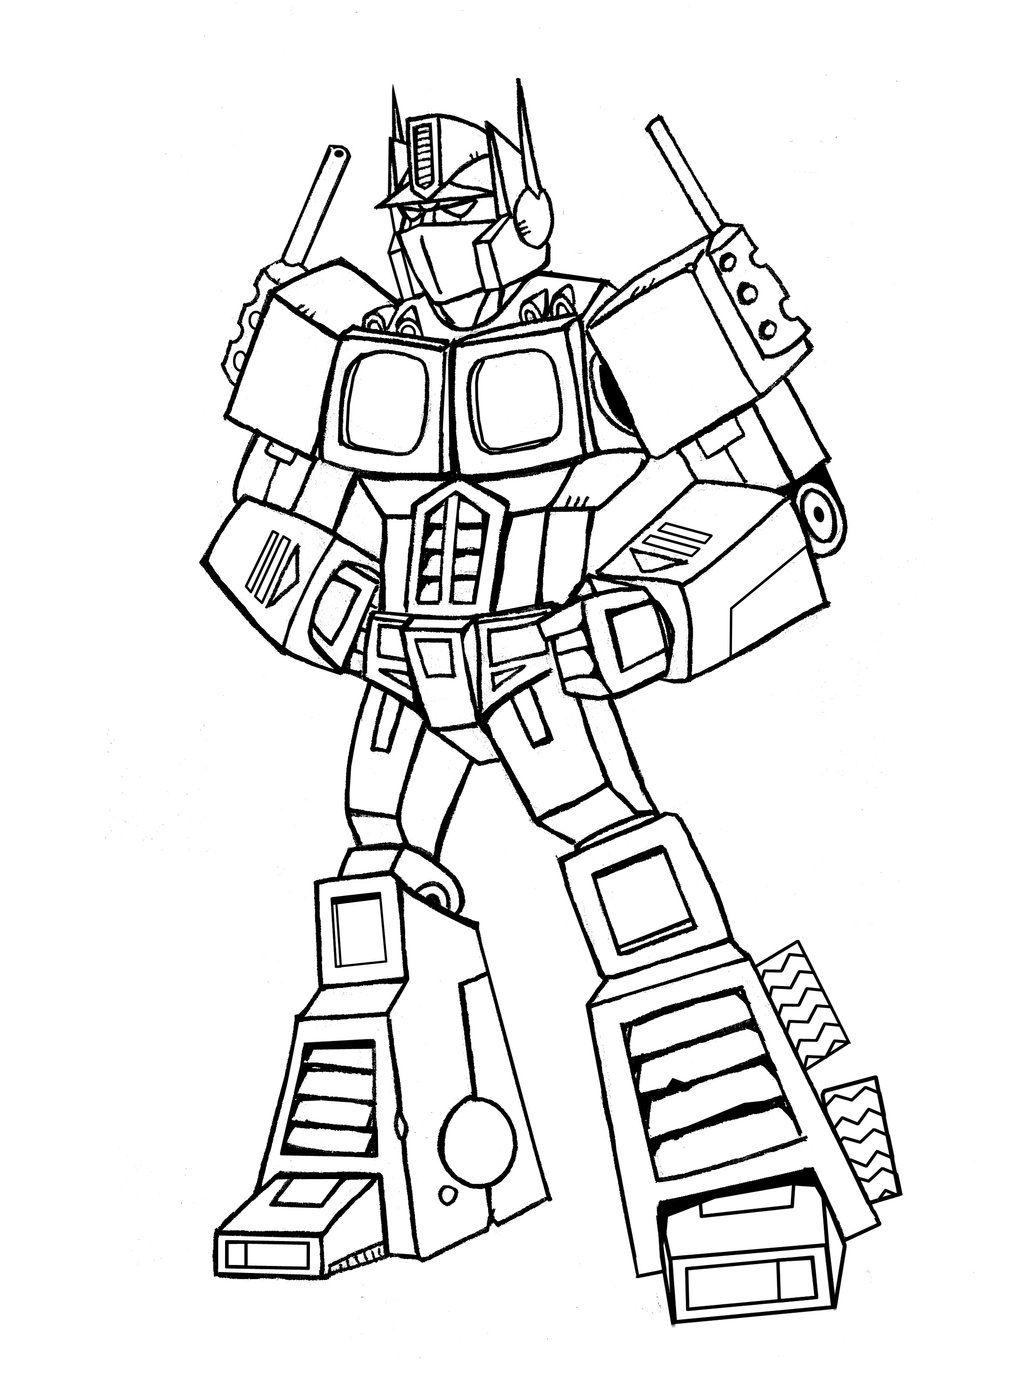 Optimus Prime Drawing Easy : optimus, prime, drawing, Transformer, Optimus, Prime, Drawing, Library